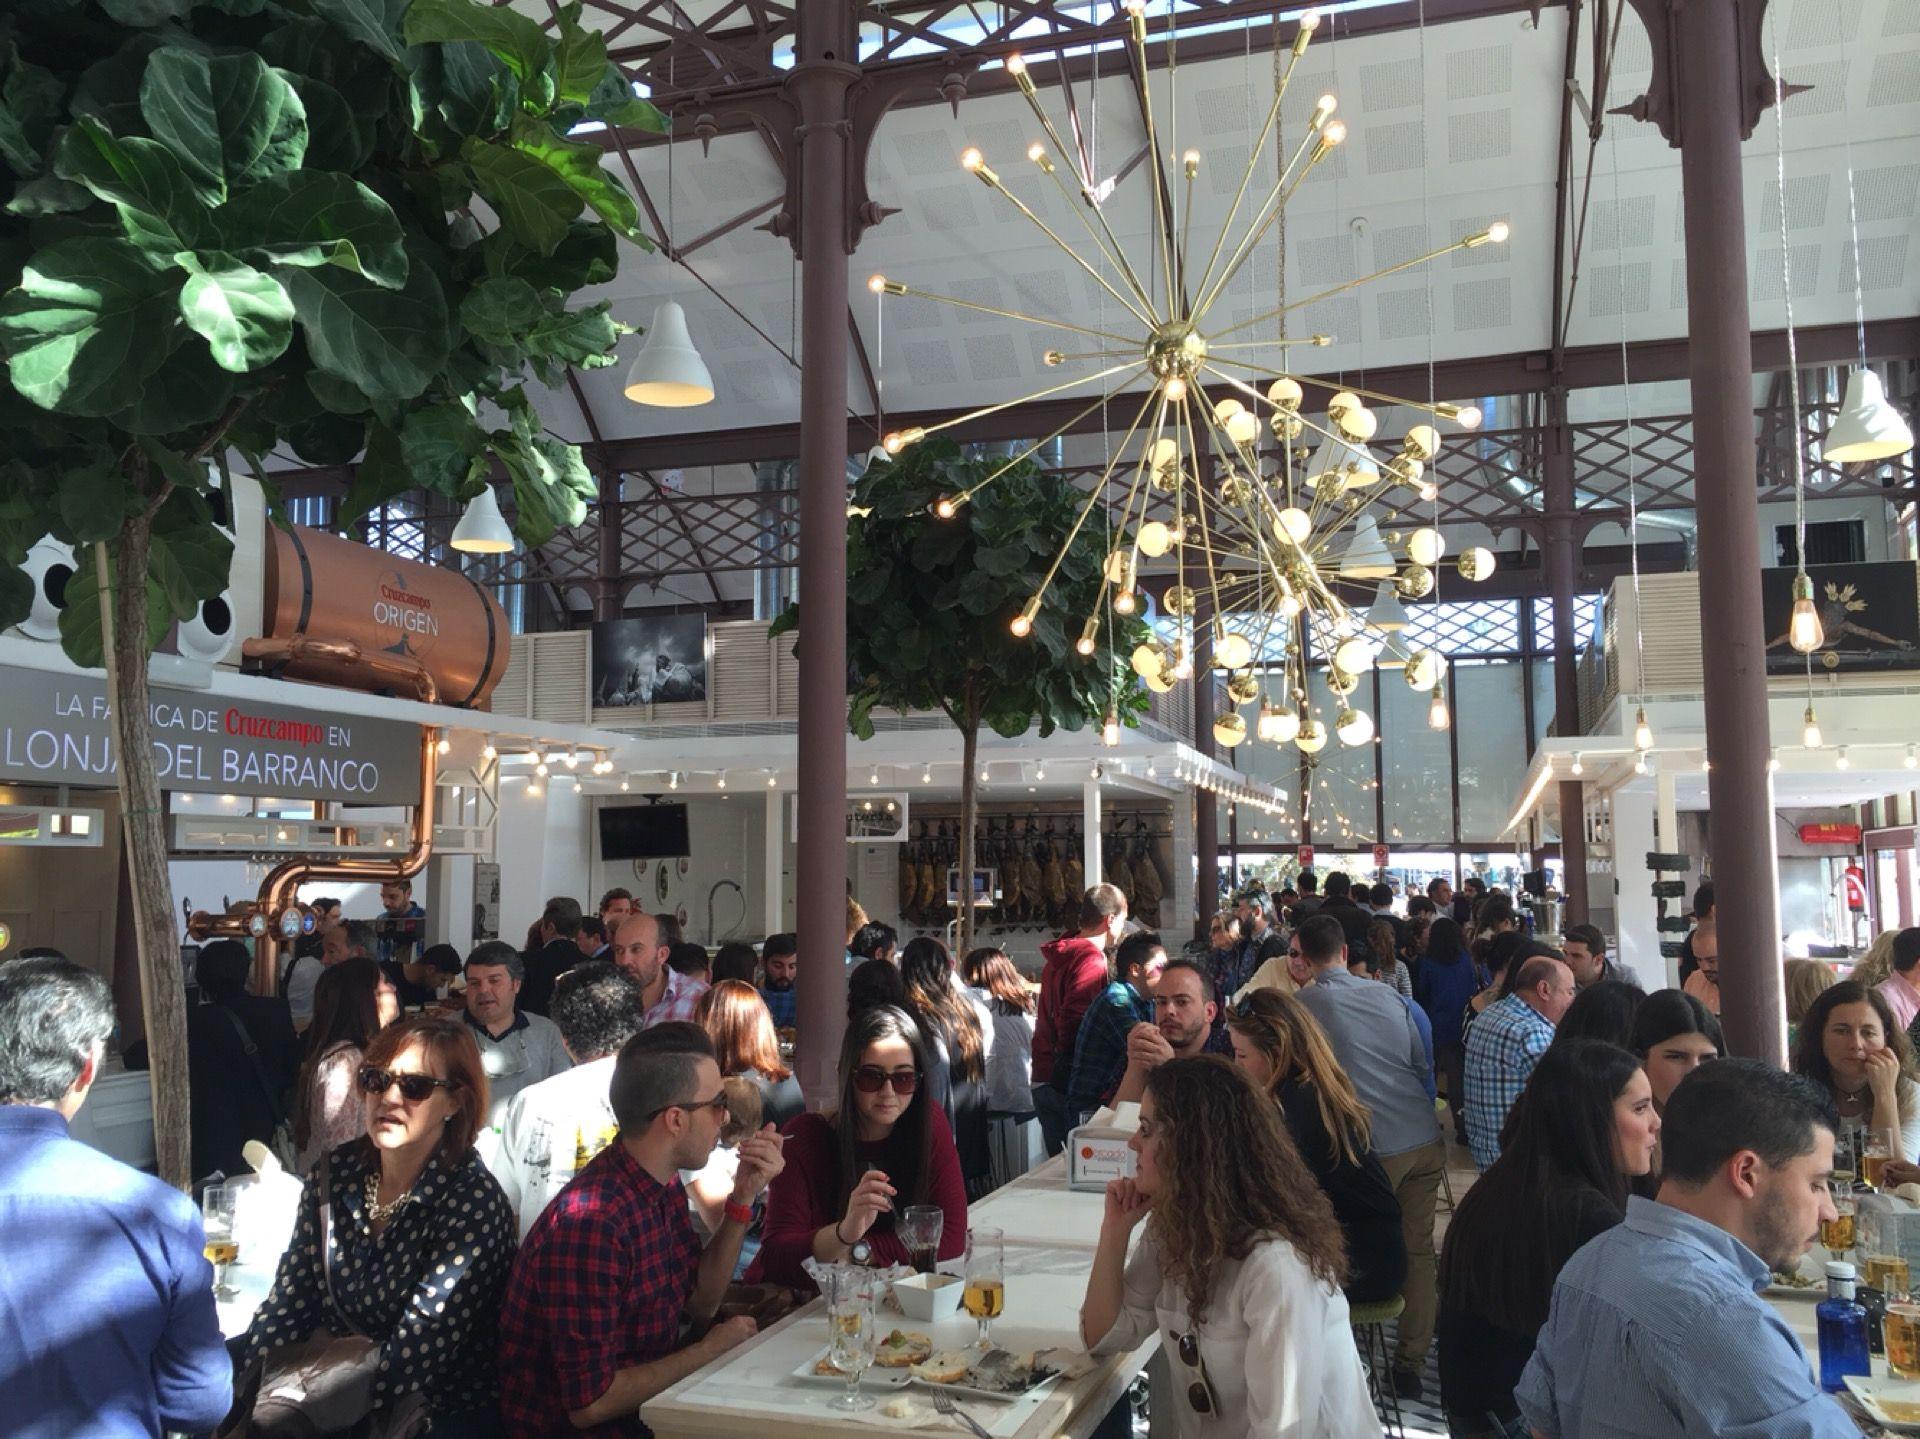 Mercado Lonja Del Barranco Seville Andalucia Spain